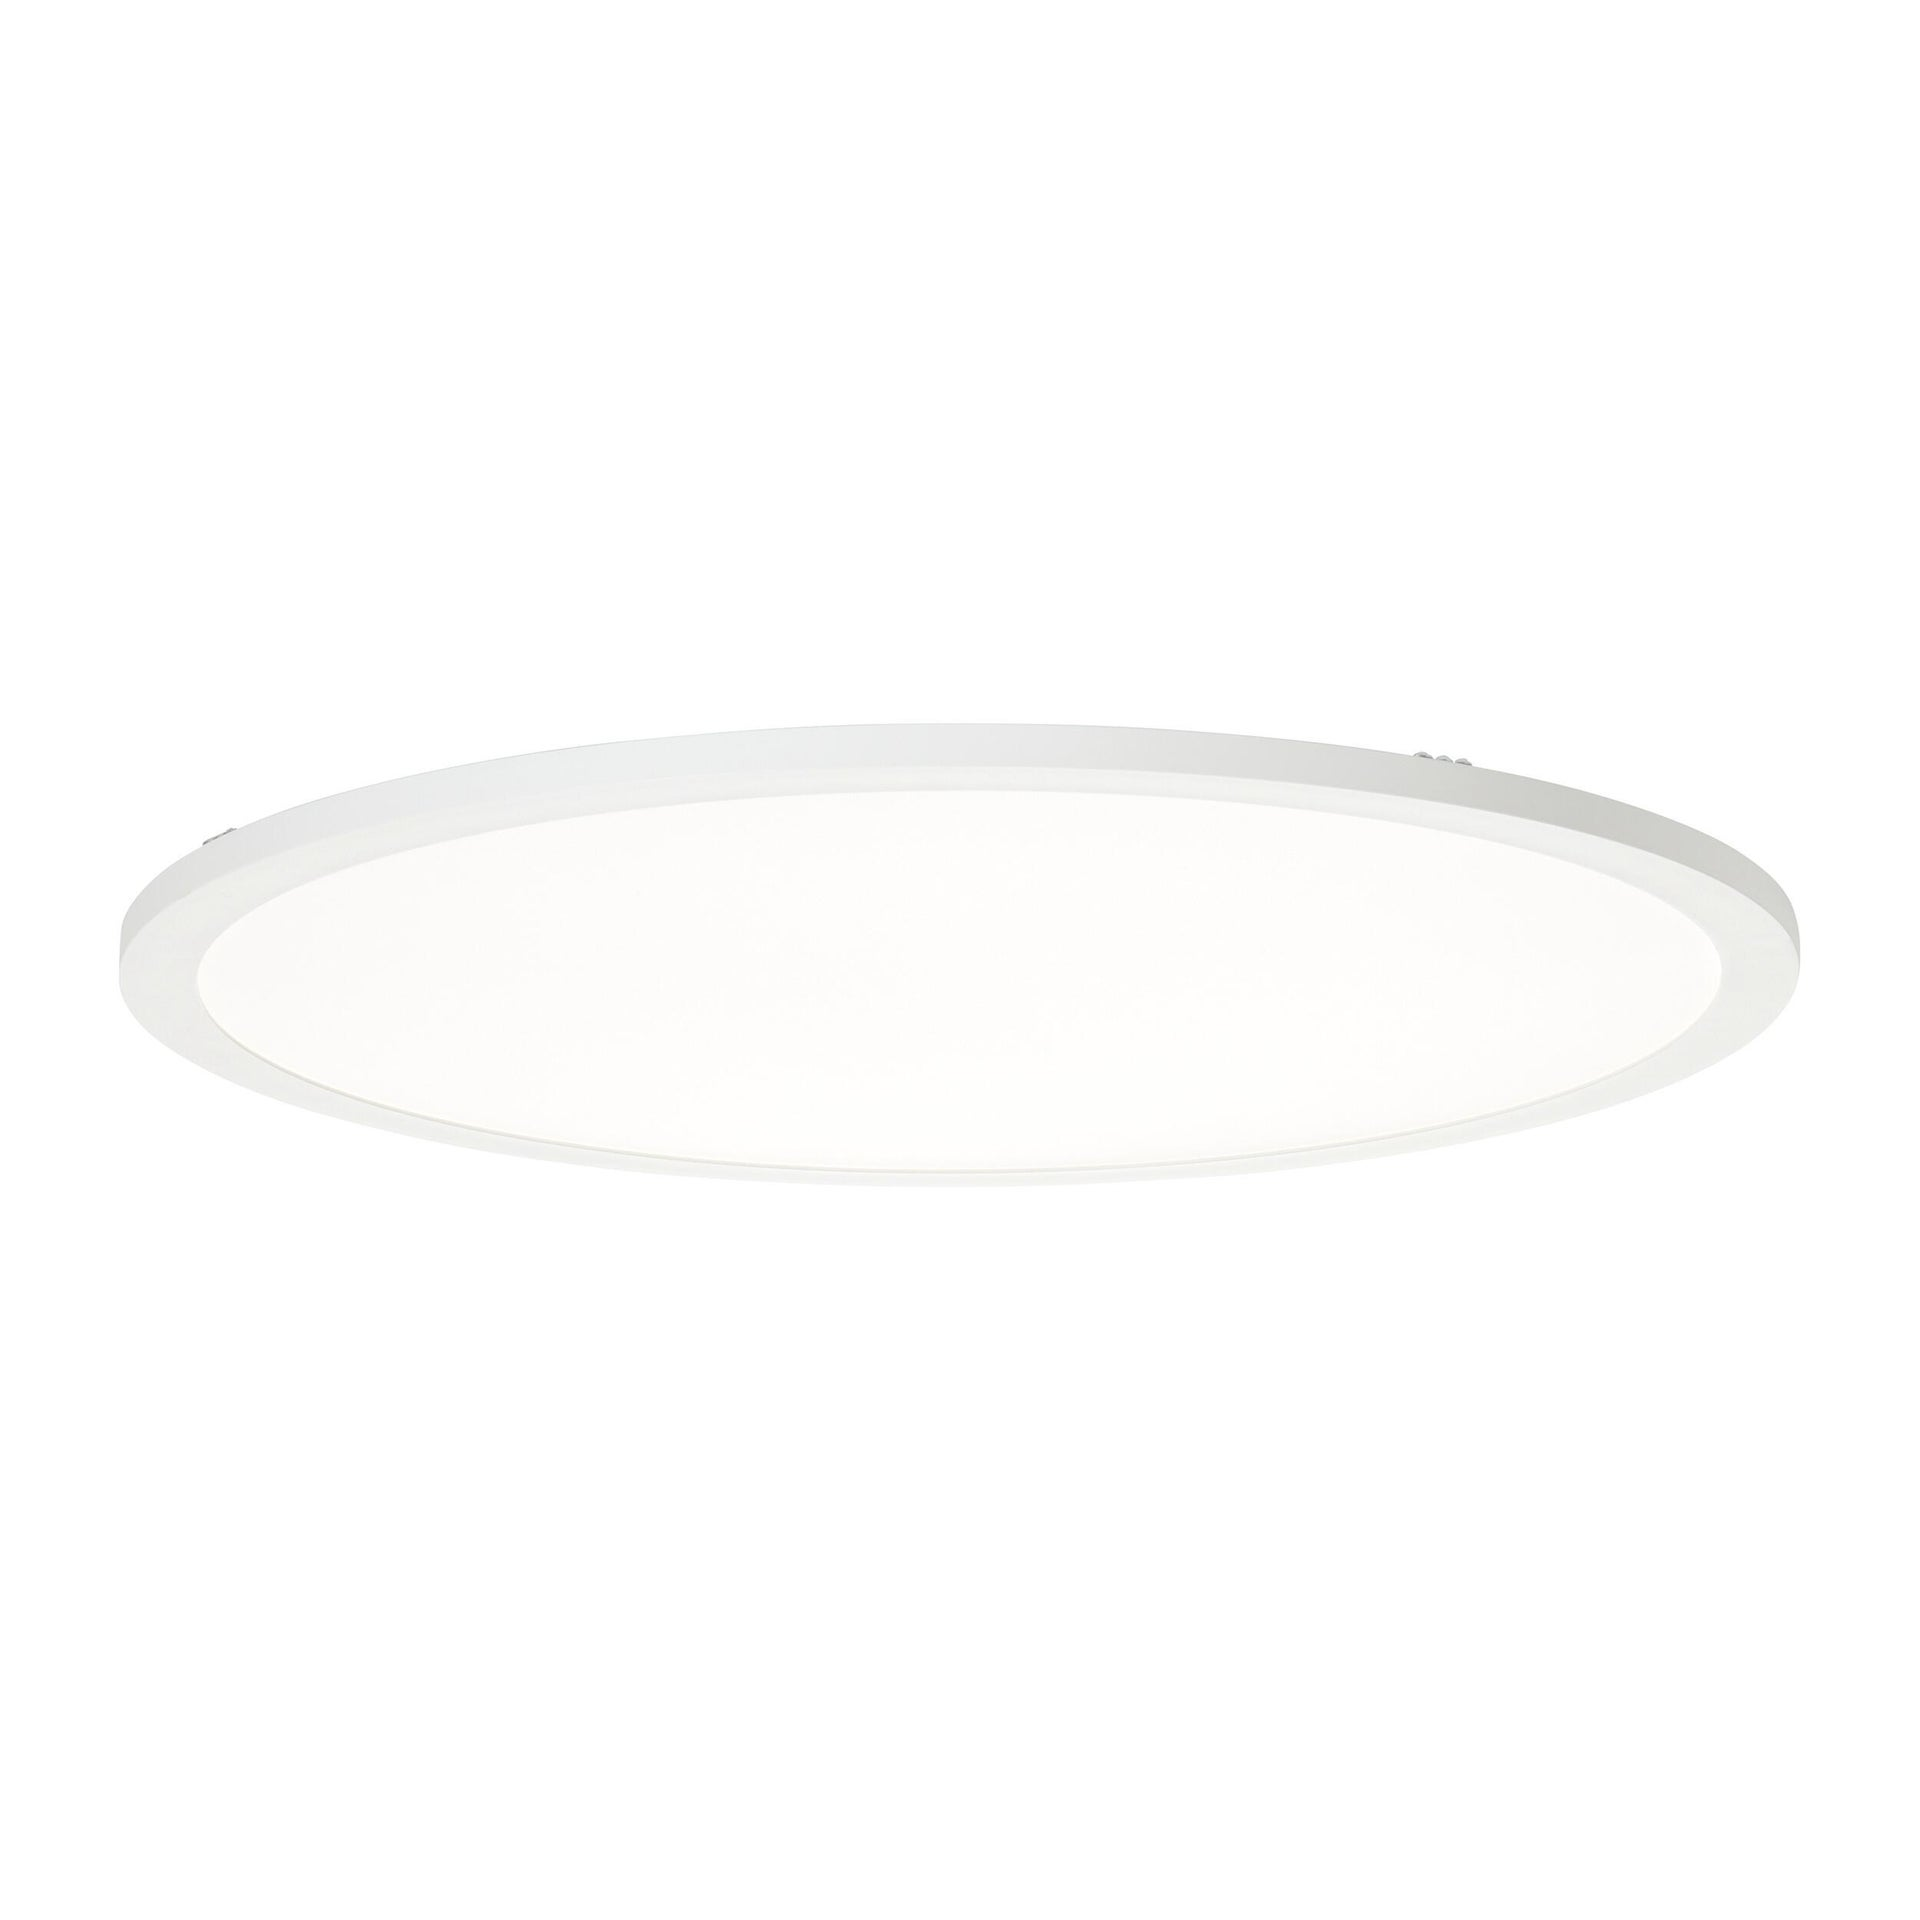 Pannello led Abie Ø 60 cm, cct regolazione da bianco caldo a bianco freddo, 3300LM - 1